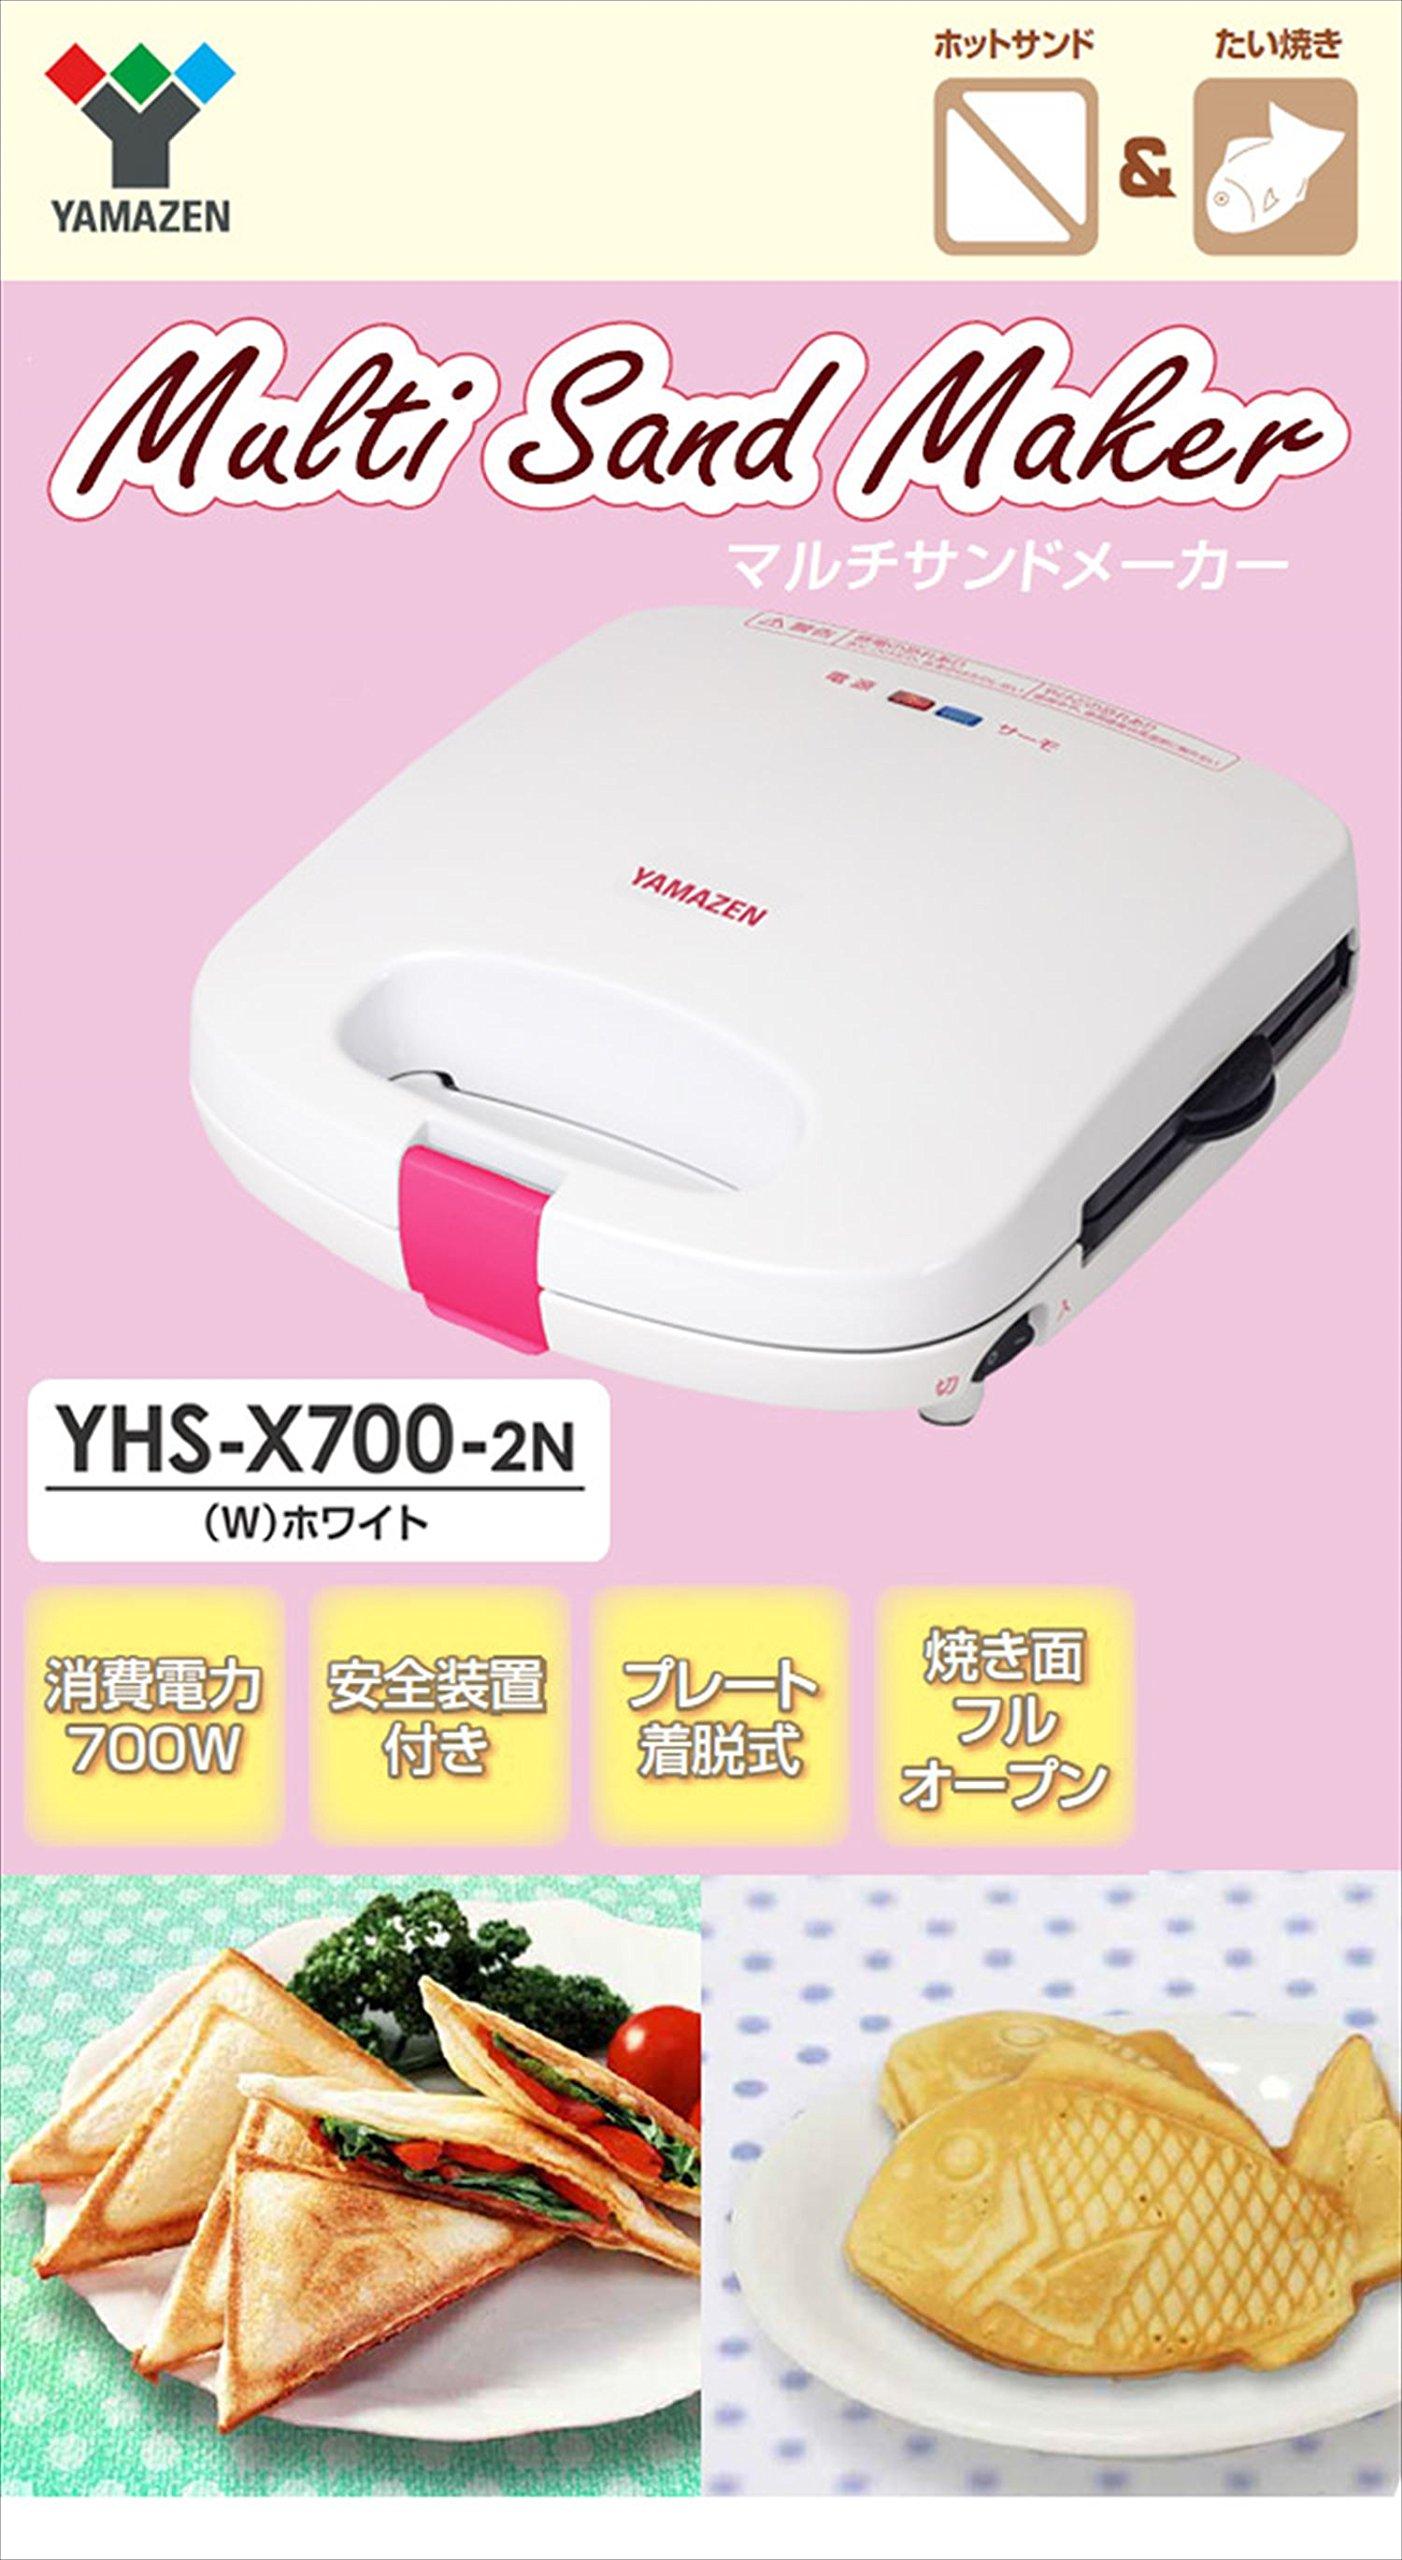 Yamazen (YAMAZEN) multi Sand maker (with hot sand Taiyaki plate) White YHS-X700-2N (W) by Yamazen (YAMAZEN) (Image #2)